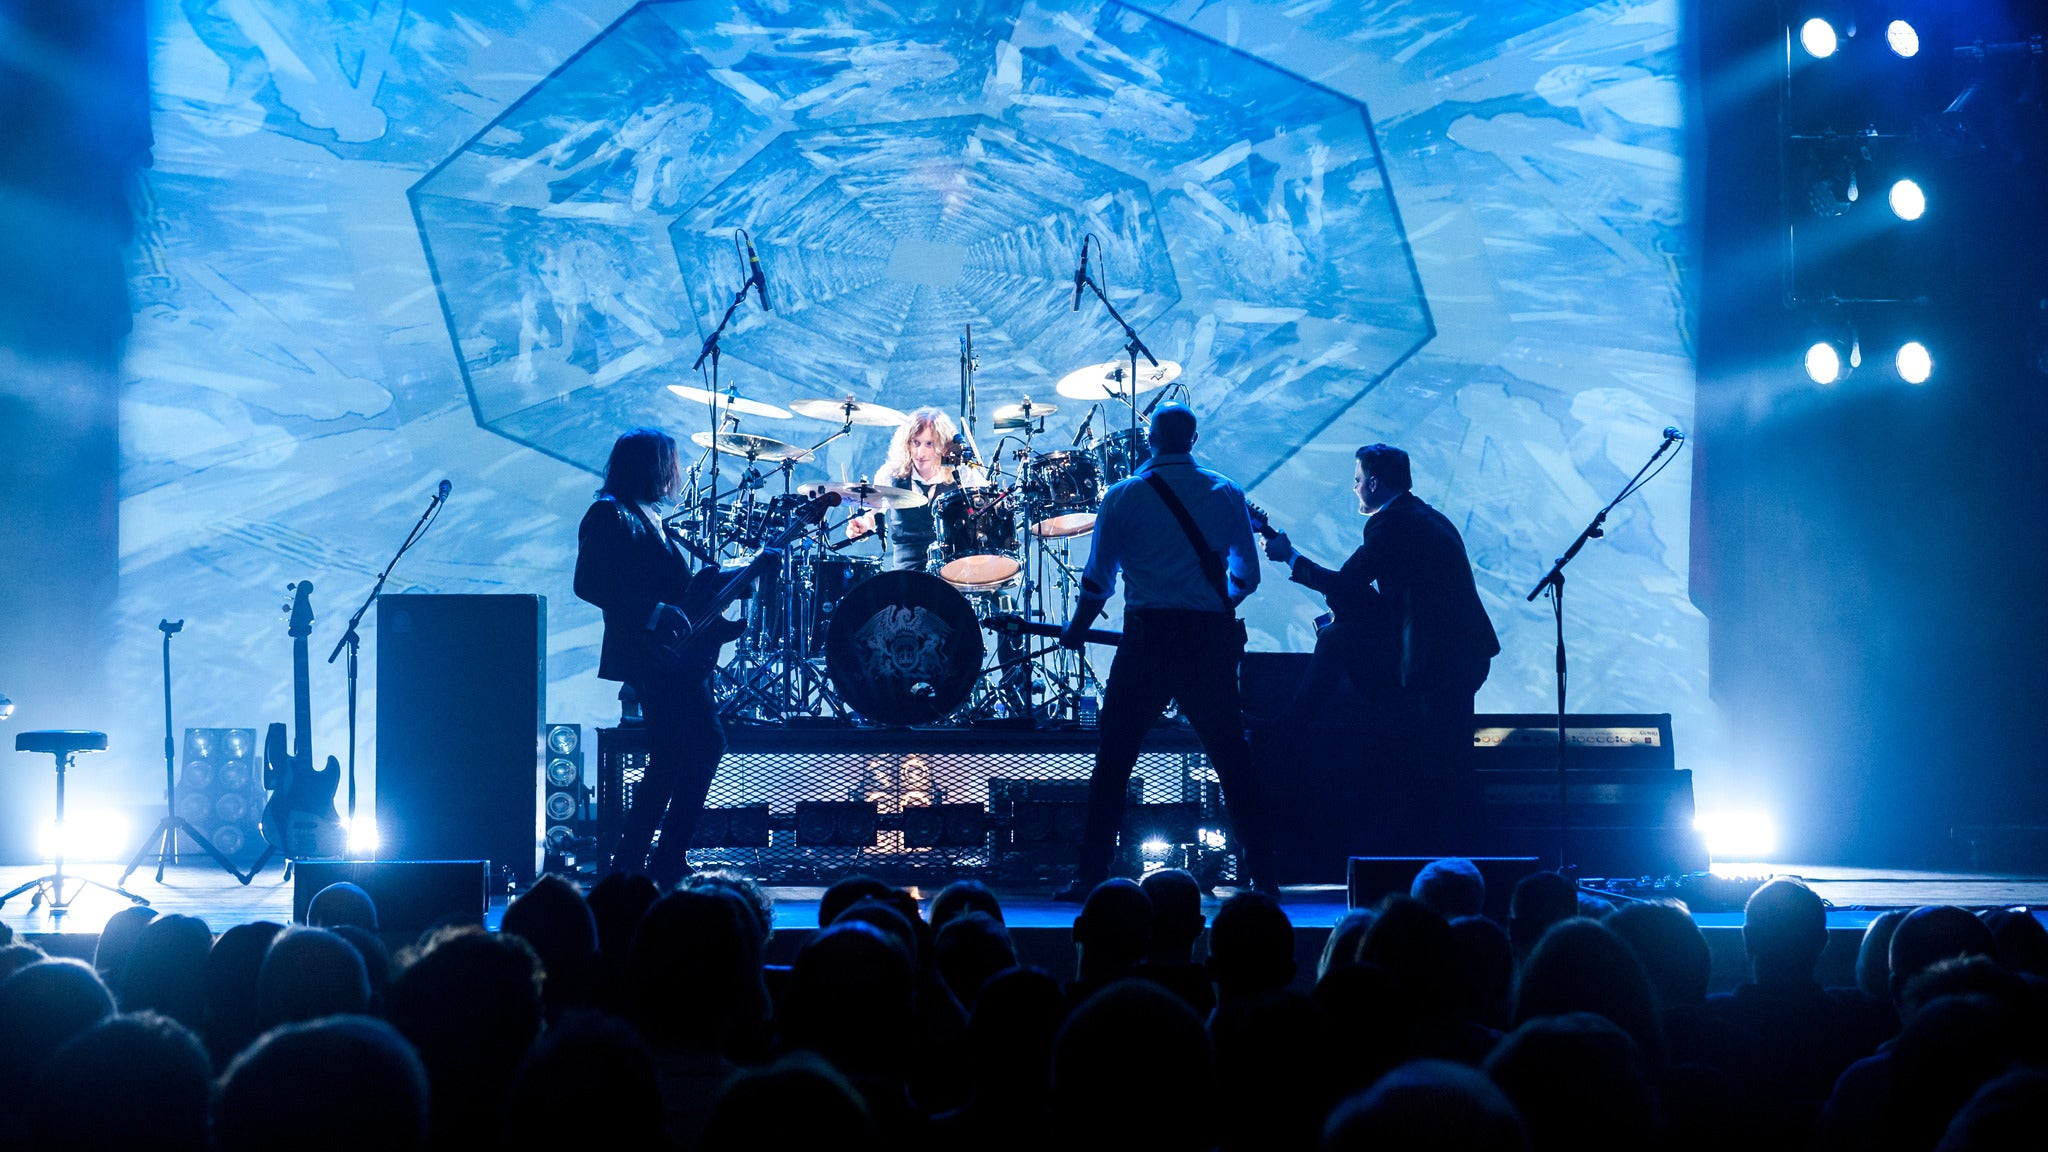 Queen Extravaganza Performing Queen's Greatest Hits